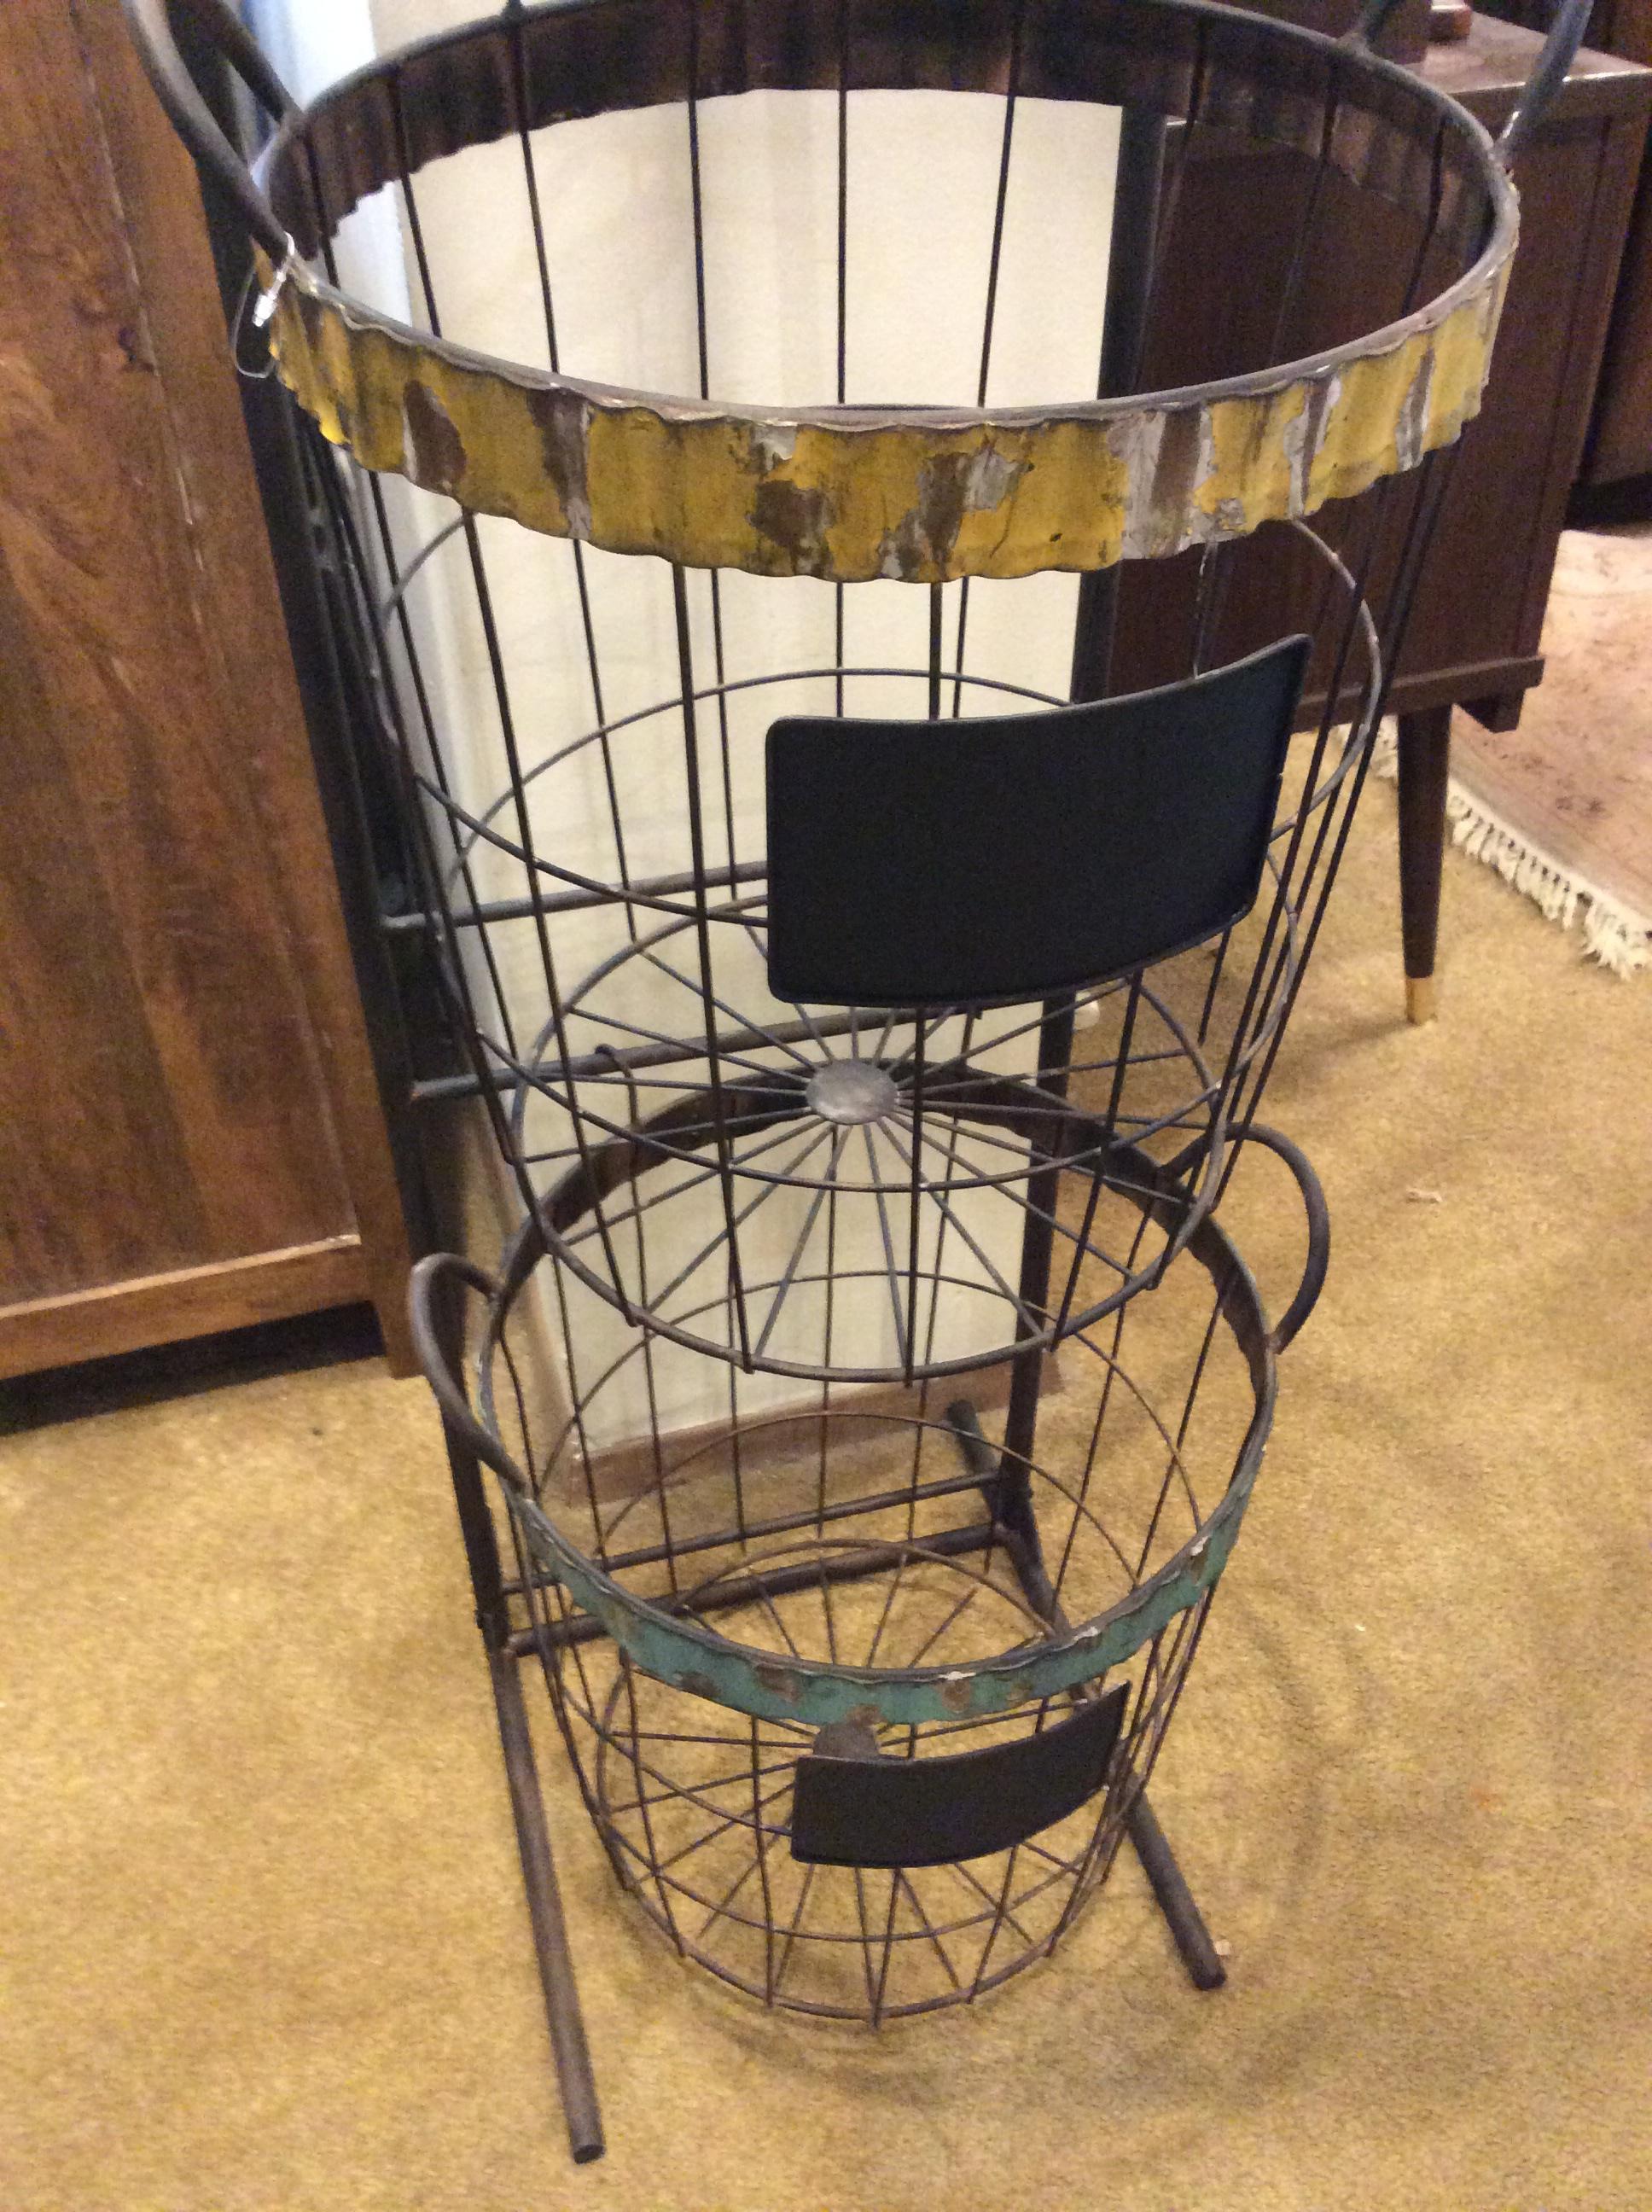 Metal Fruit Basket Stand 125 Ballard Consignment